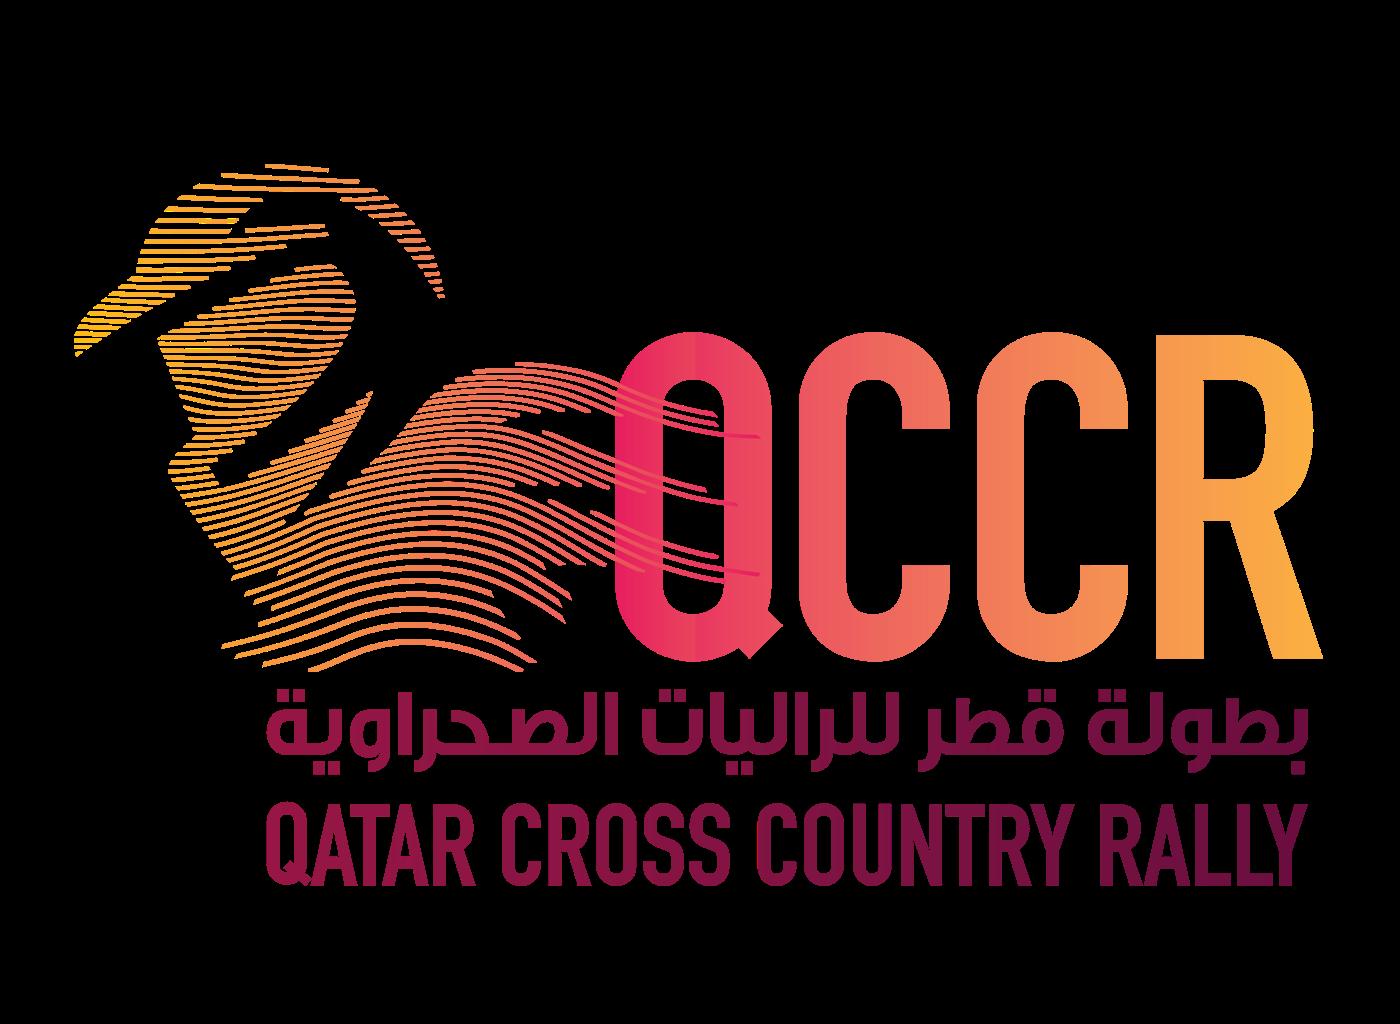 Qatar Cross Country